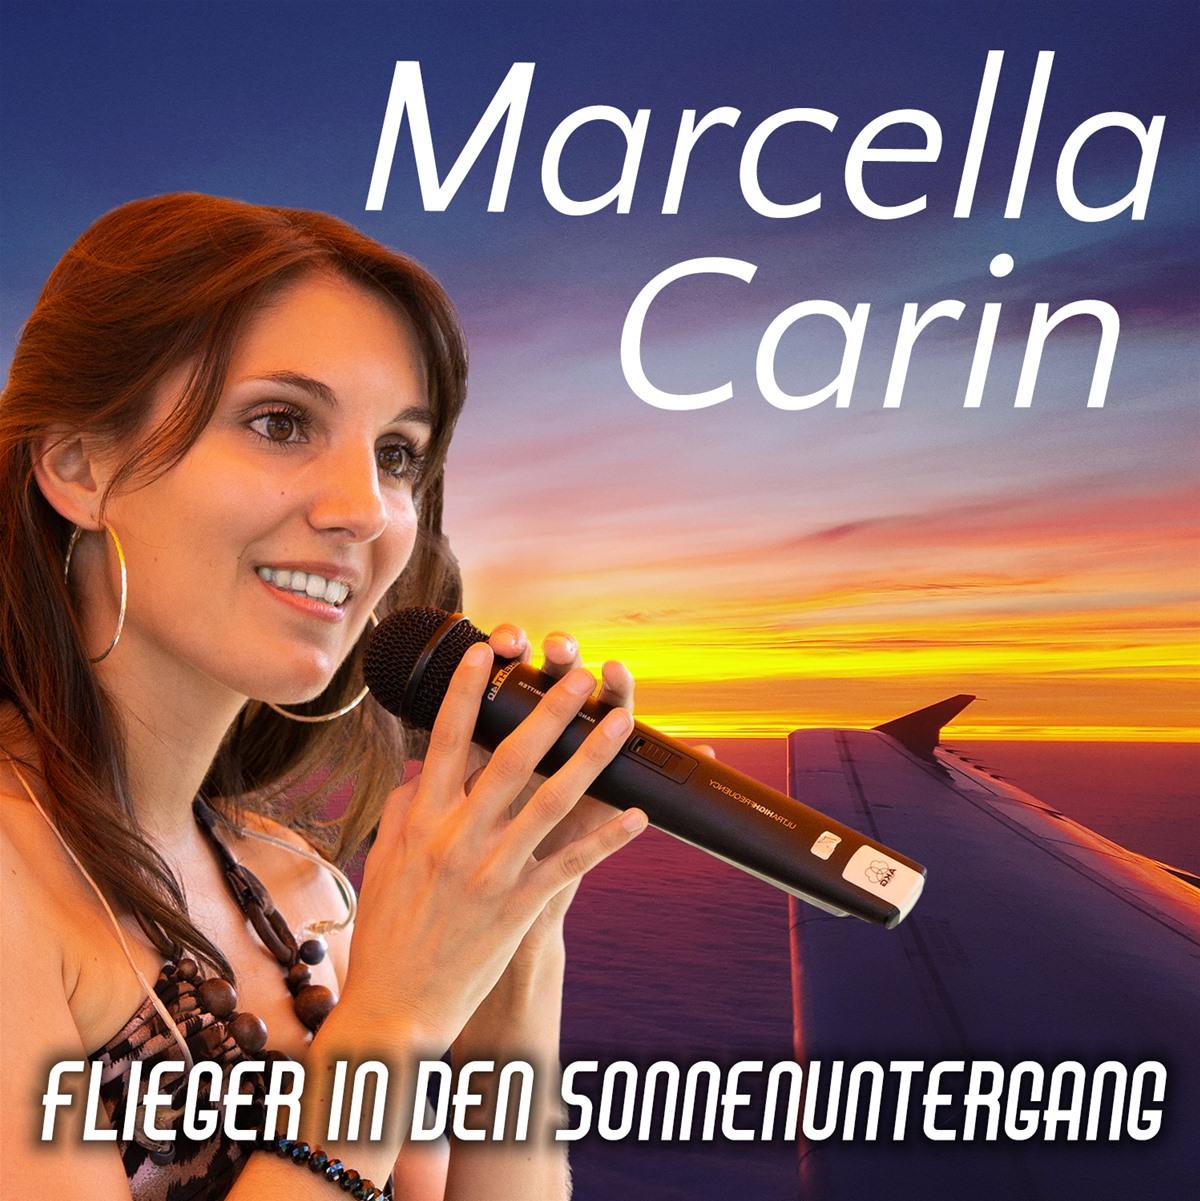 Marcella Carin - Flieger in den Sonnenuntergang (2021)